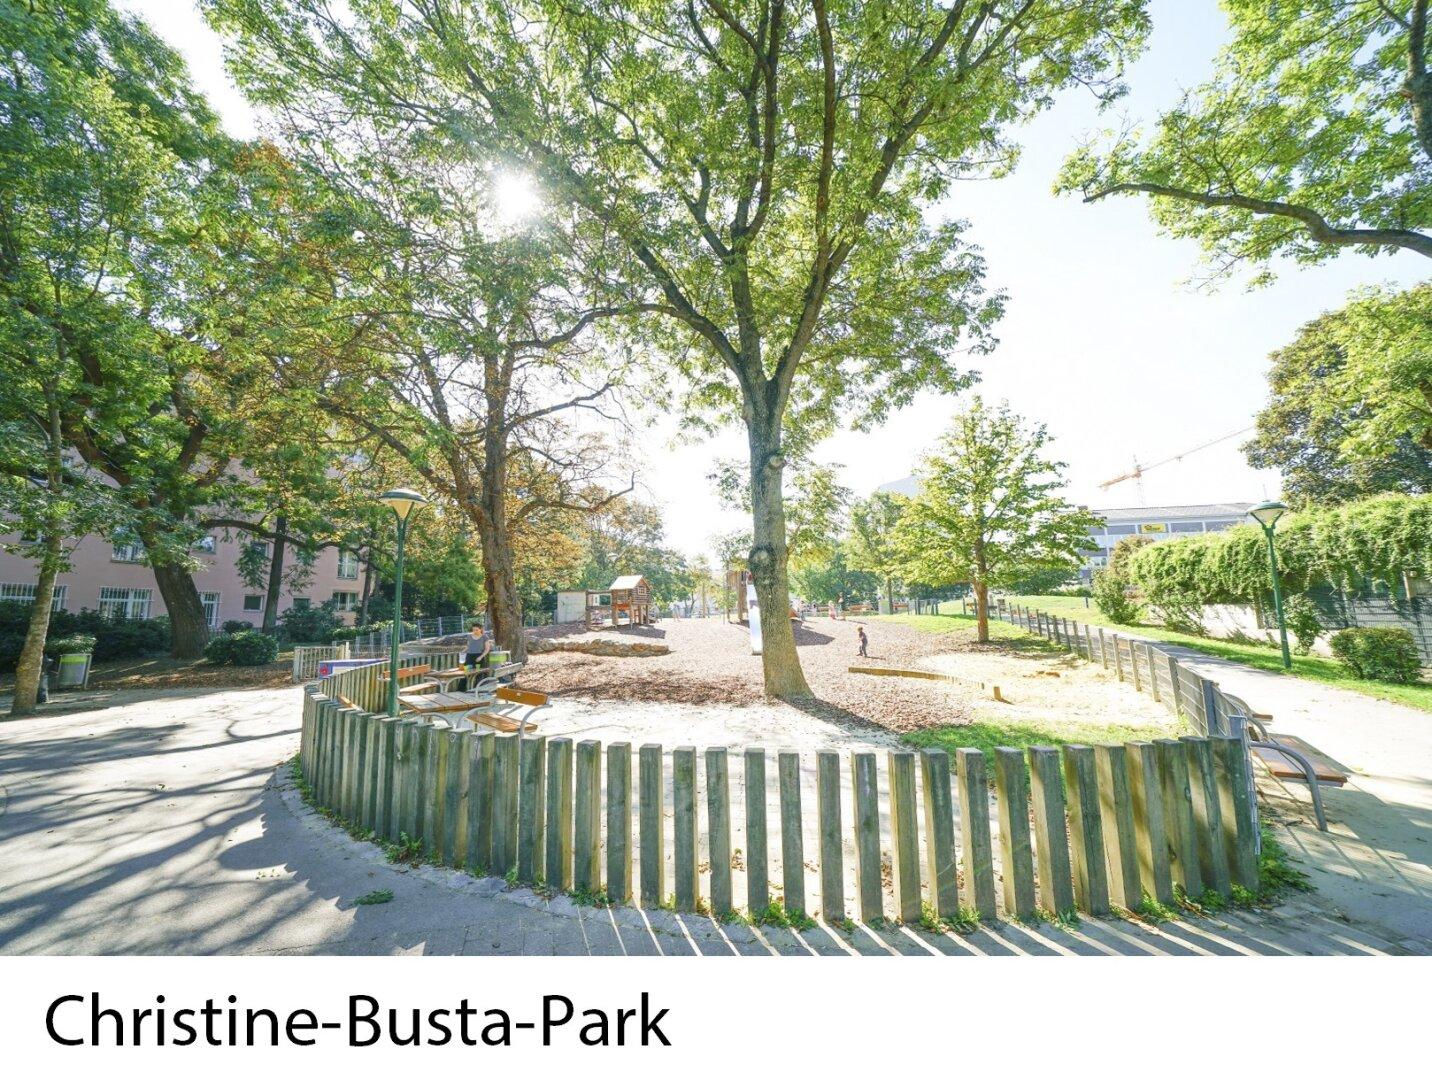 Nahe Christine-Busta-Park